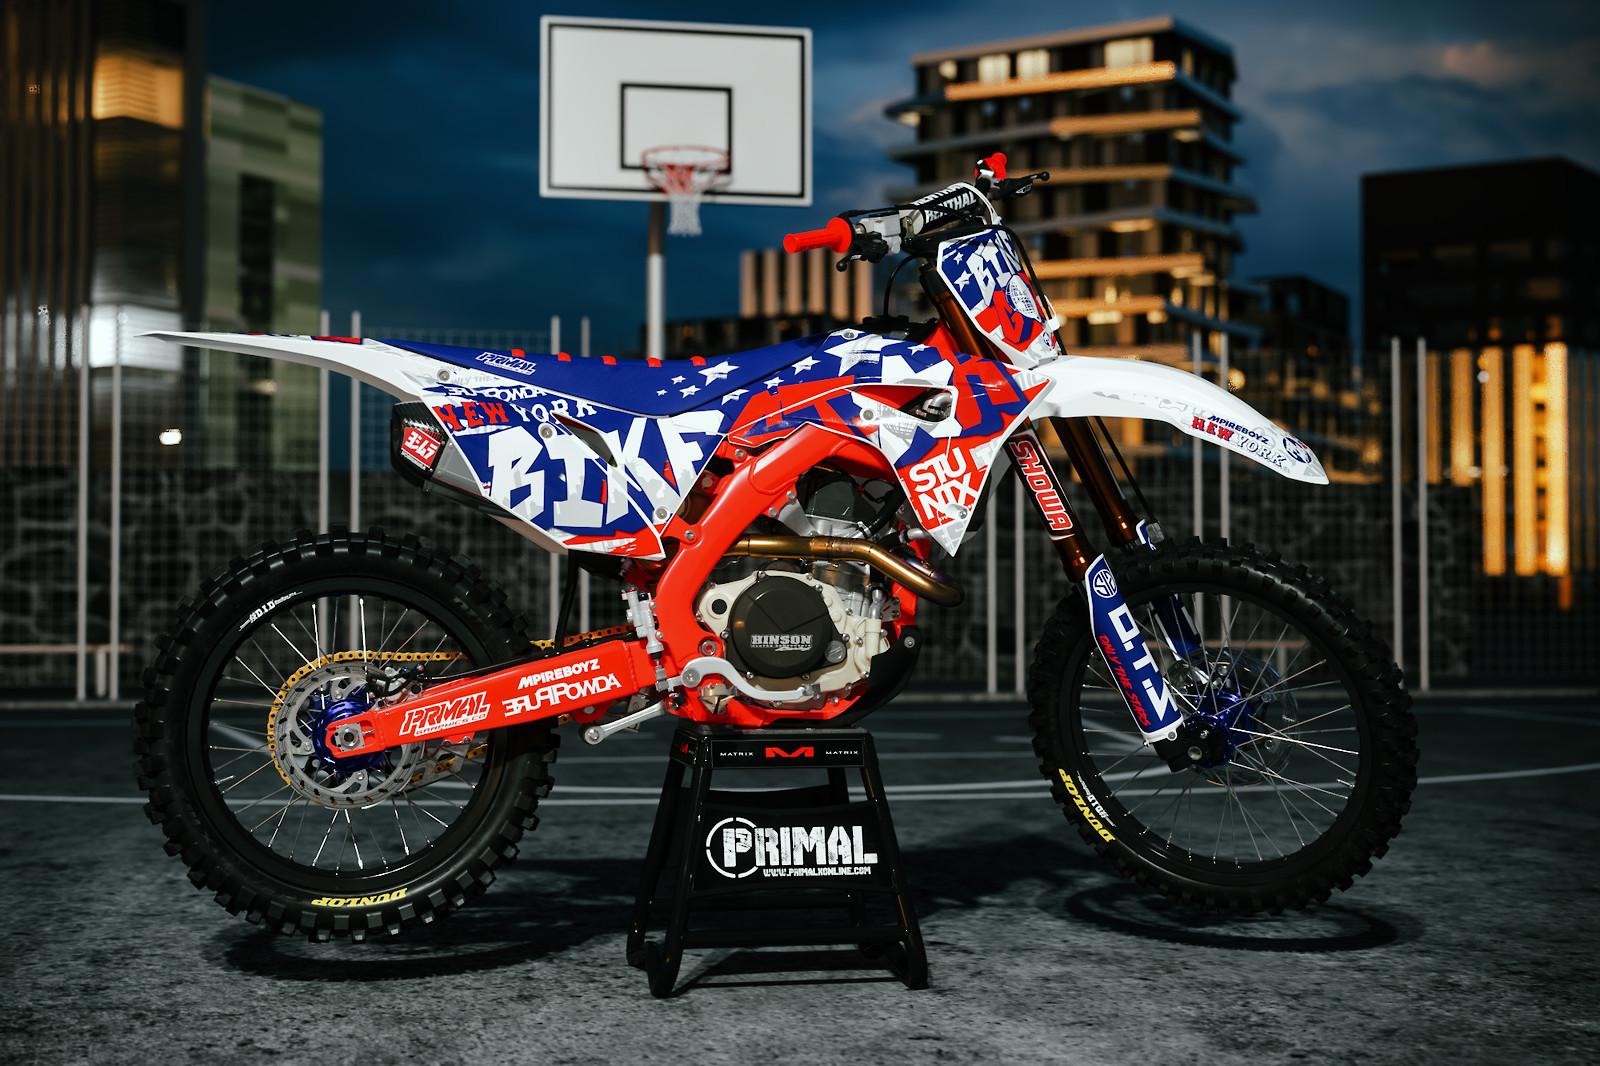 CRF leekydabikestar promo PRIMAL X MOTORSPORTS   MX GRAPHICS  - PRIMAL_X_MOTORSPORTS - Motocross Pictures - Vital MX